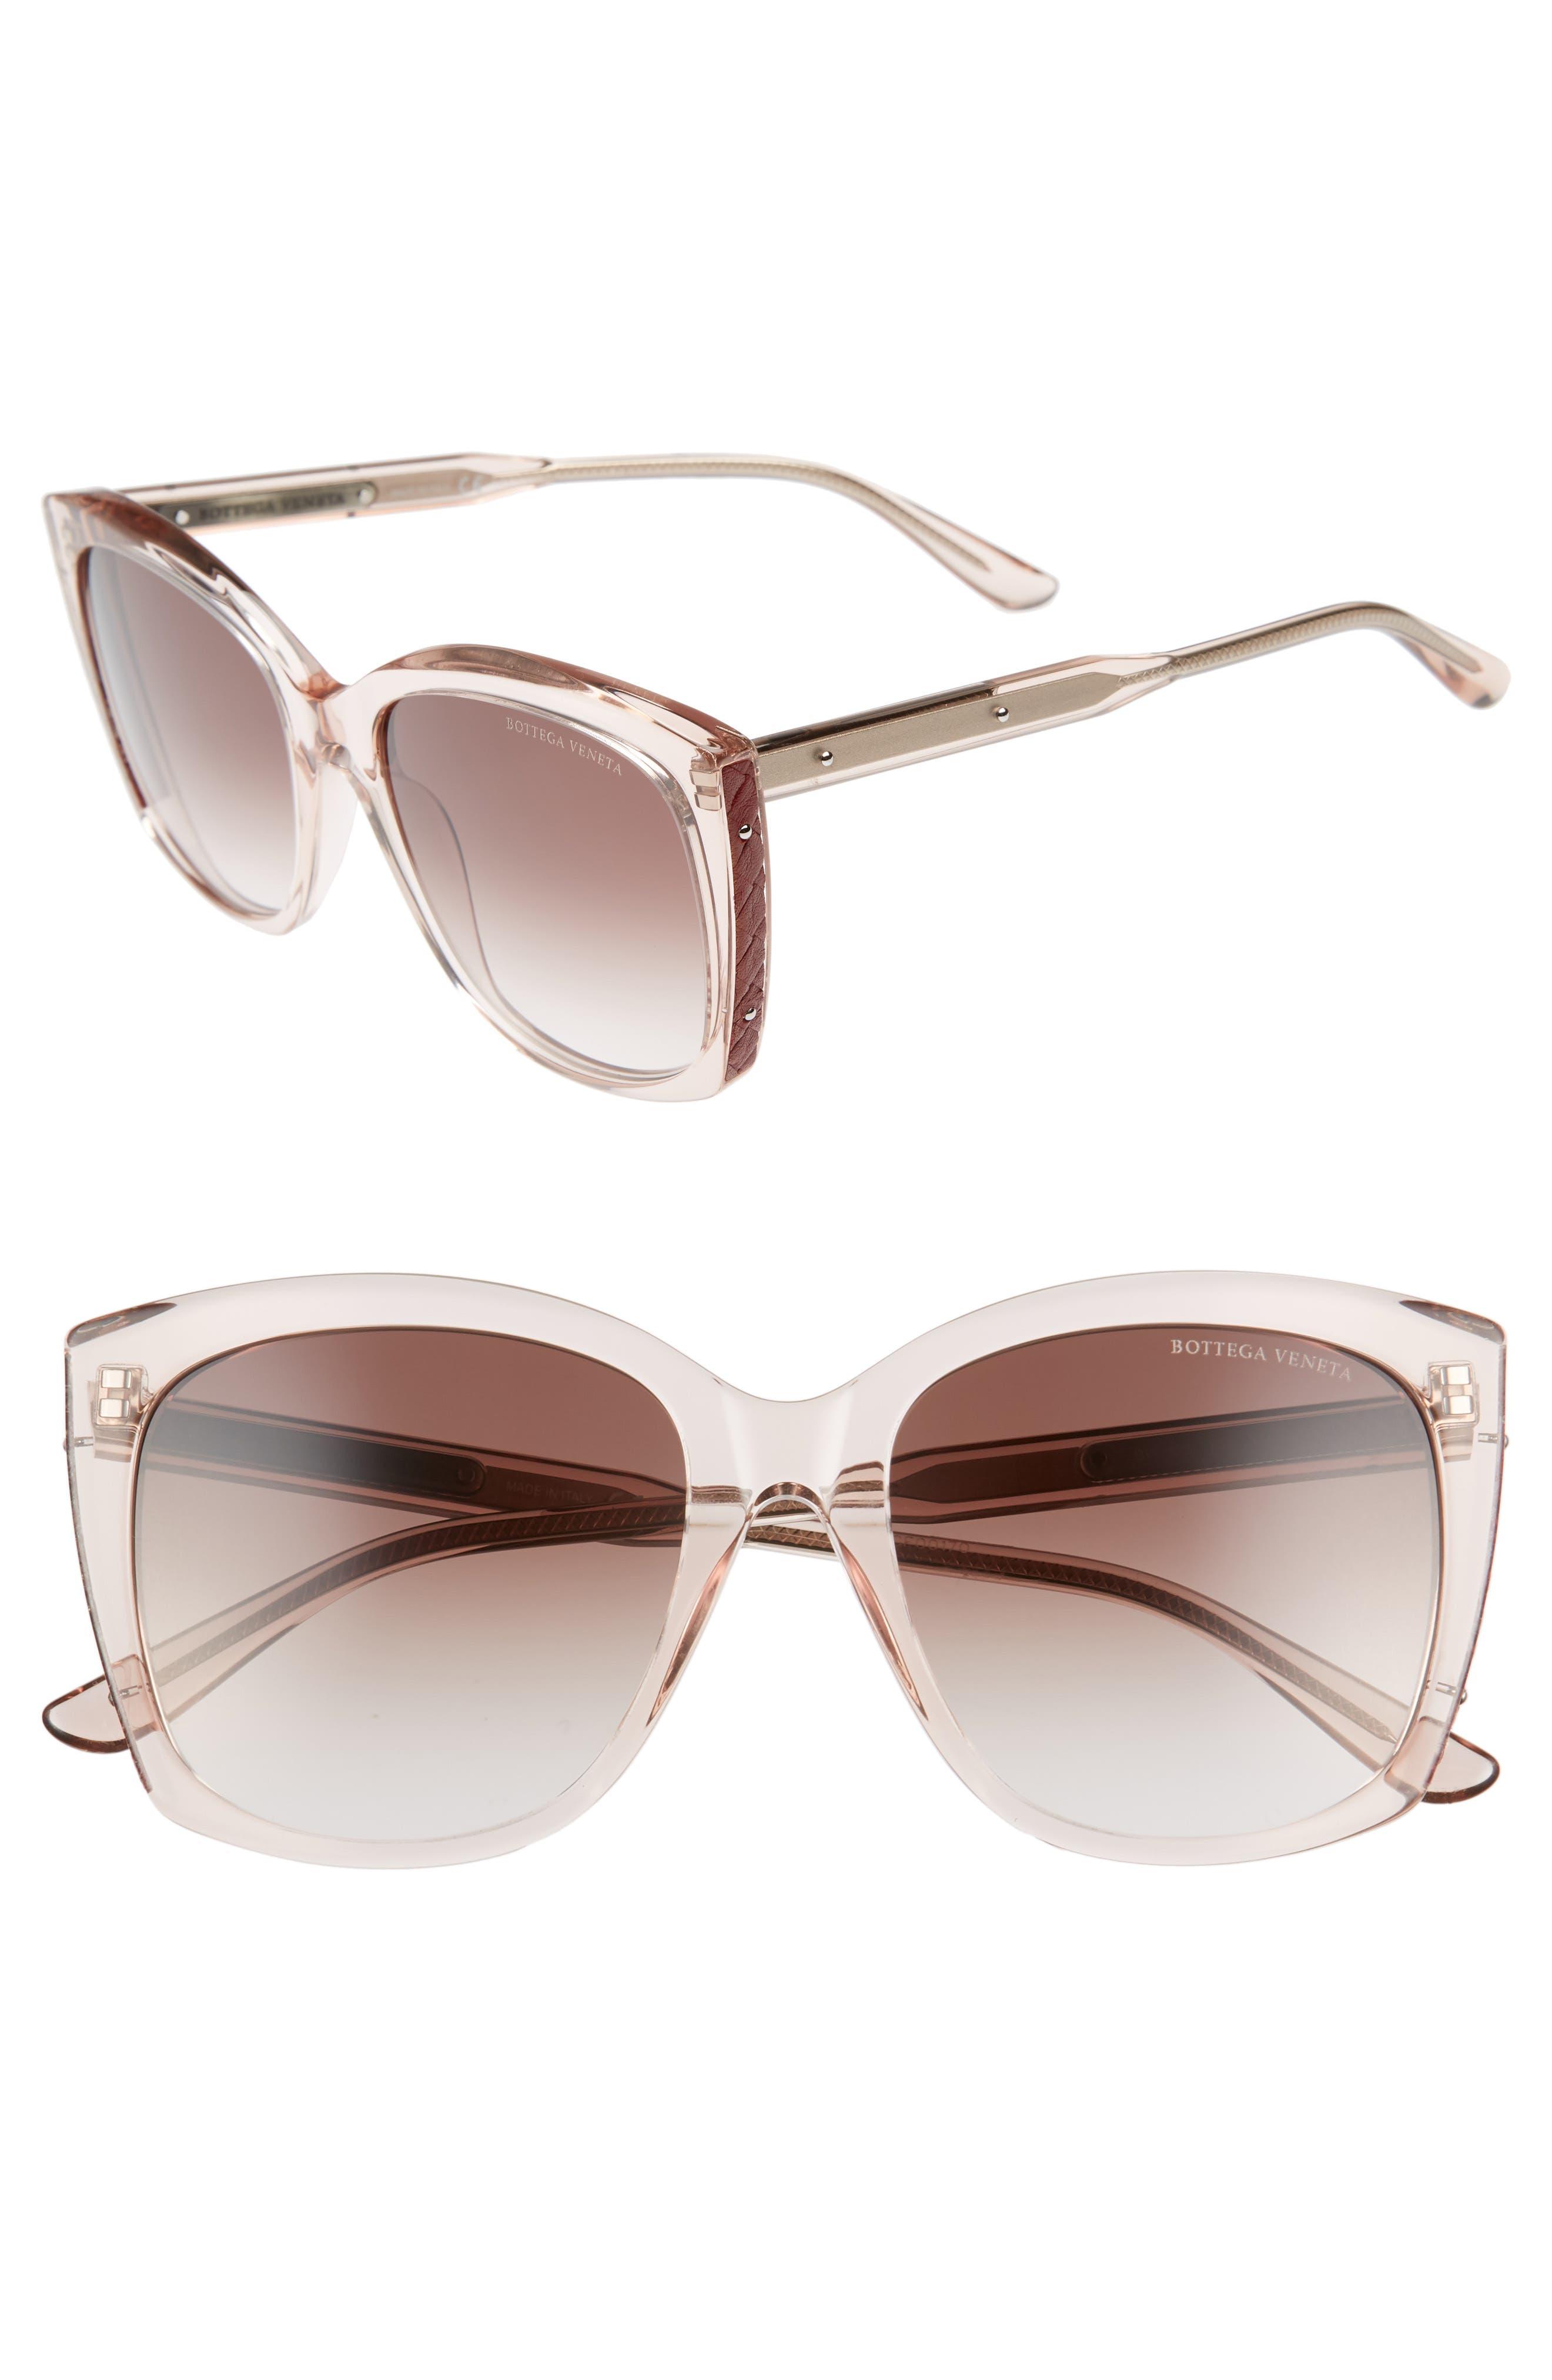 55mm Cat Eye Sunglasses,                         Main,                         color, Pink